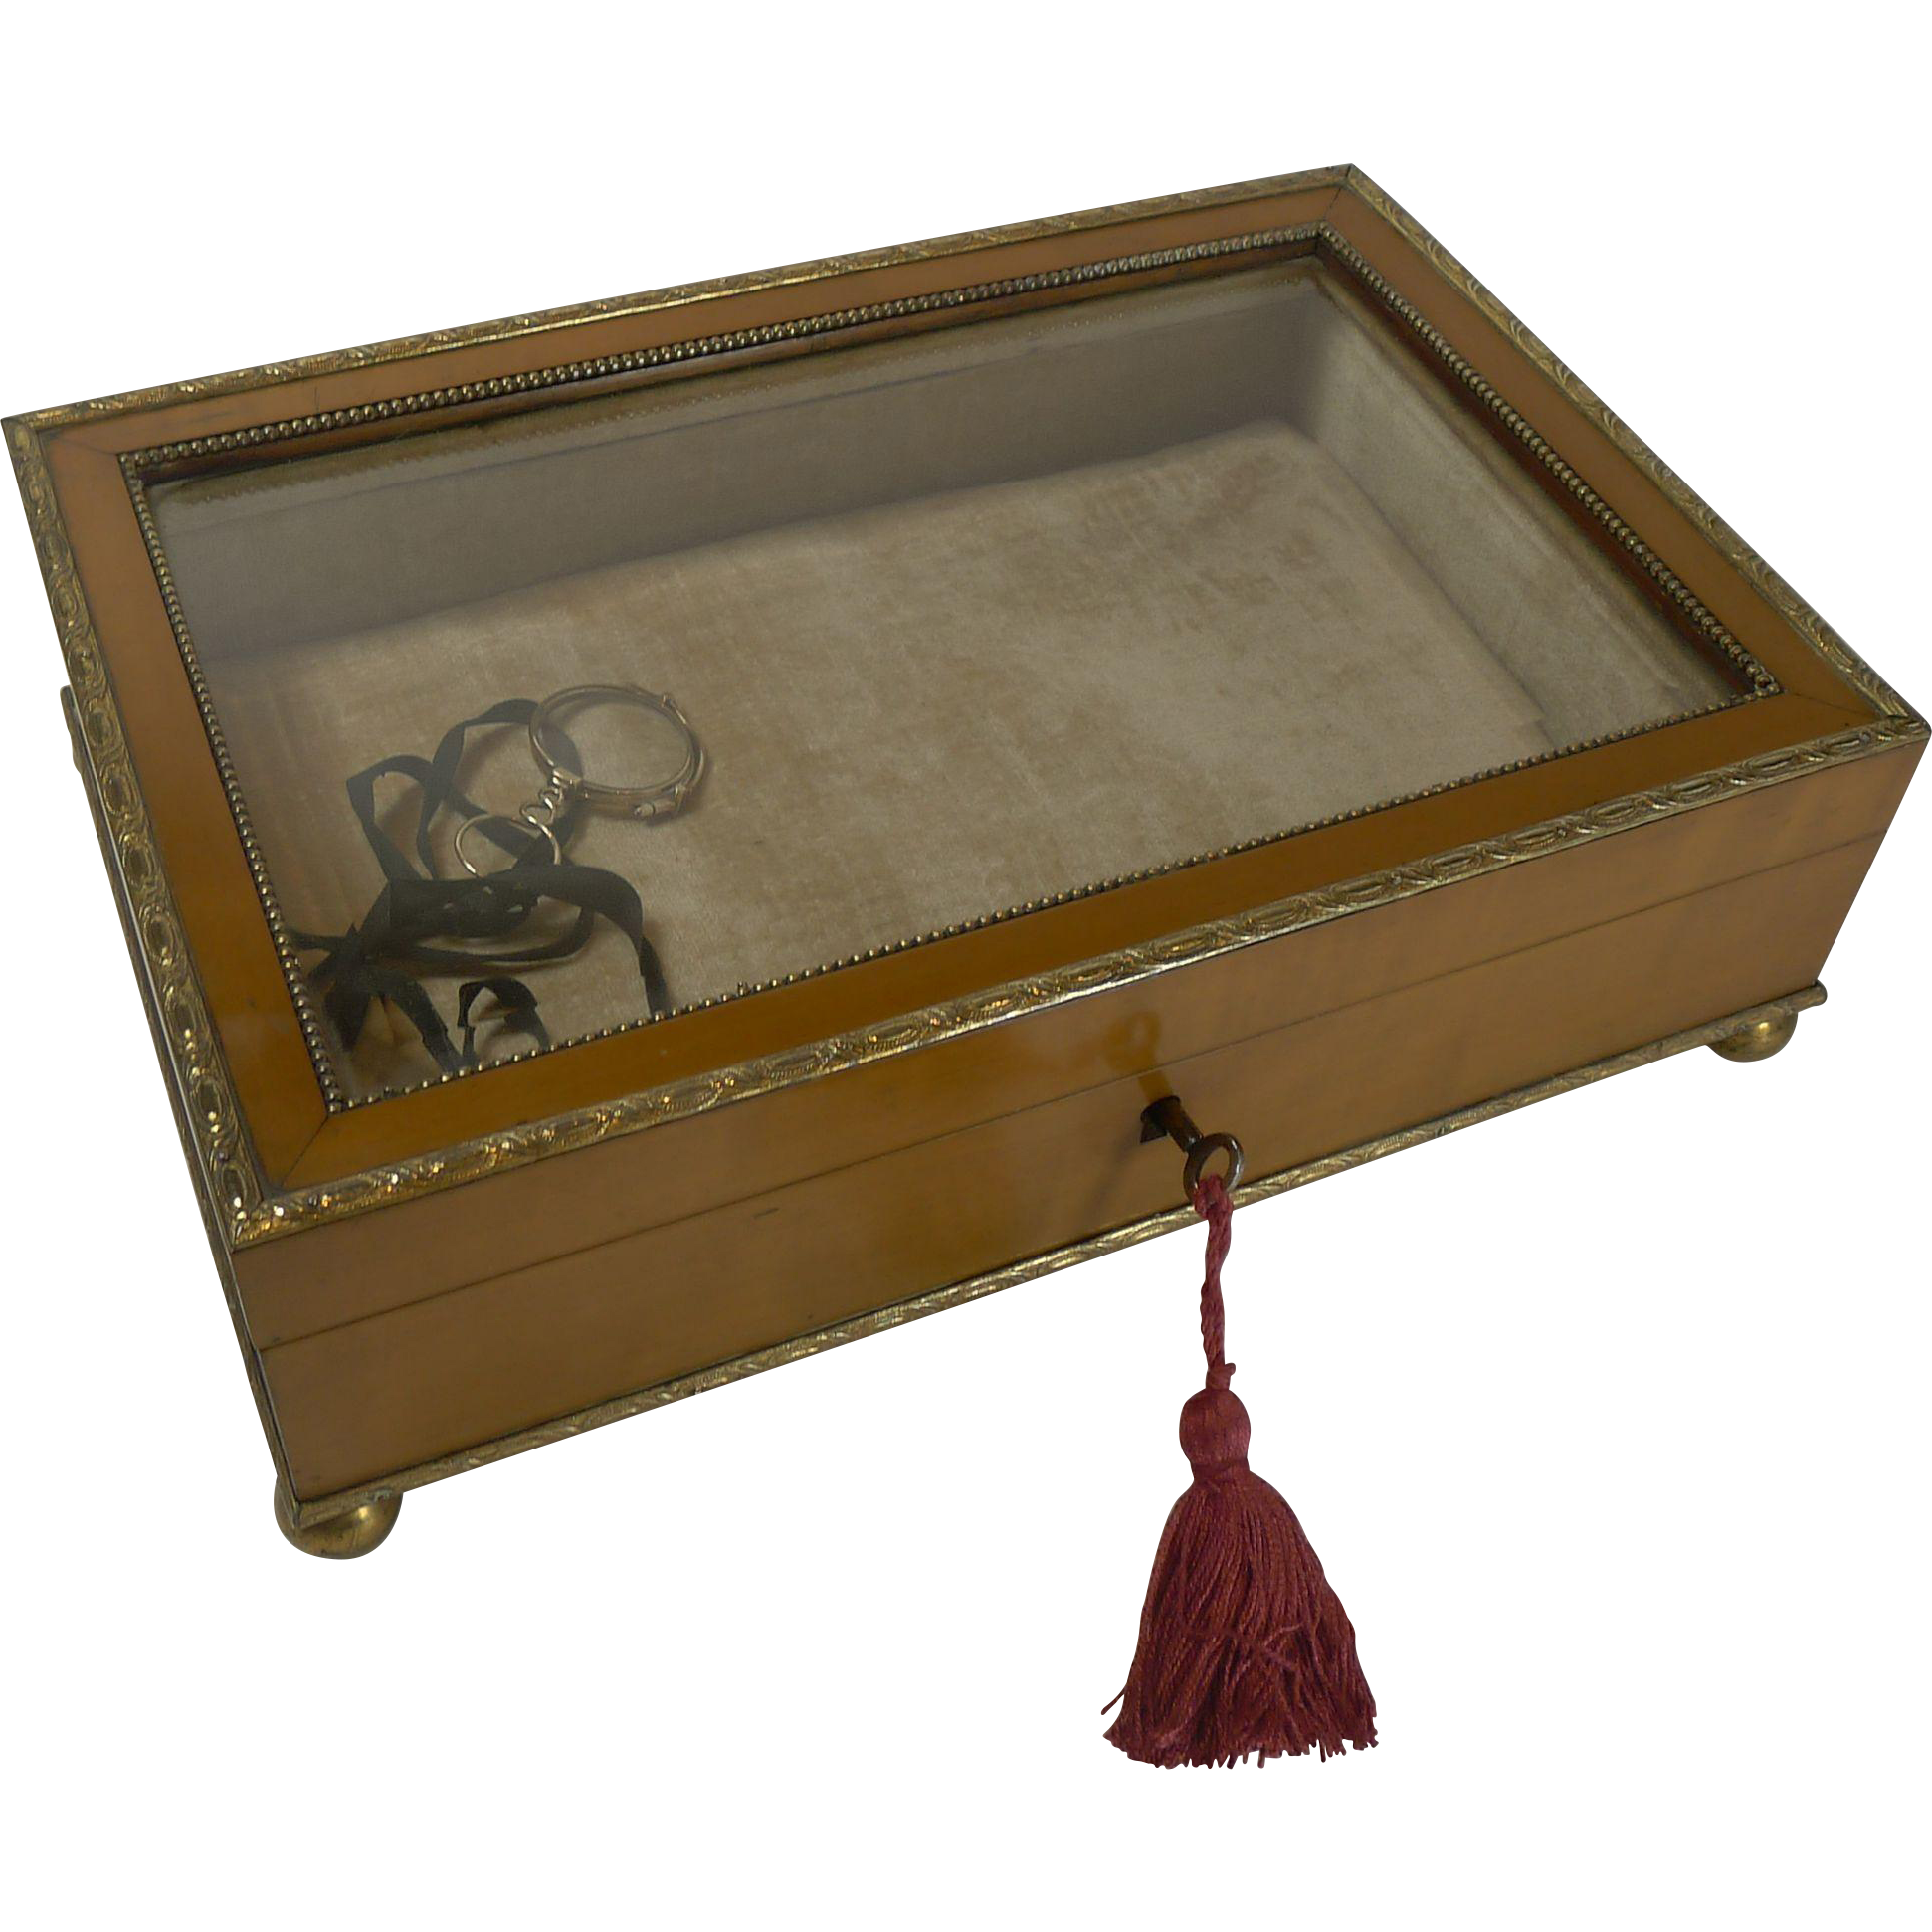 Antique English Apple Wood Display / Jewelry Box c.1880